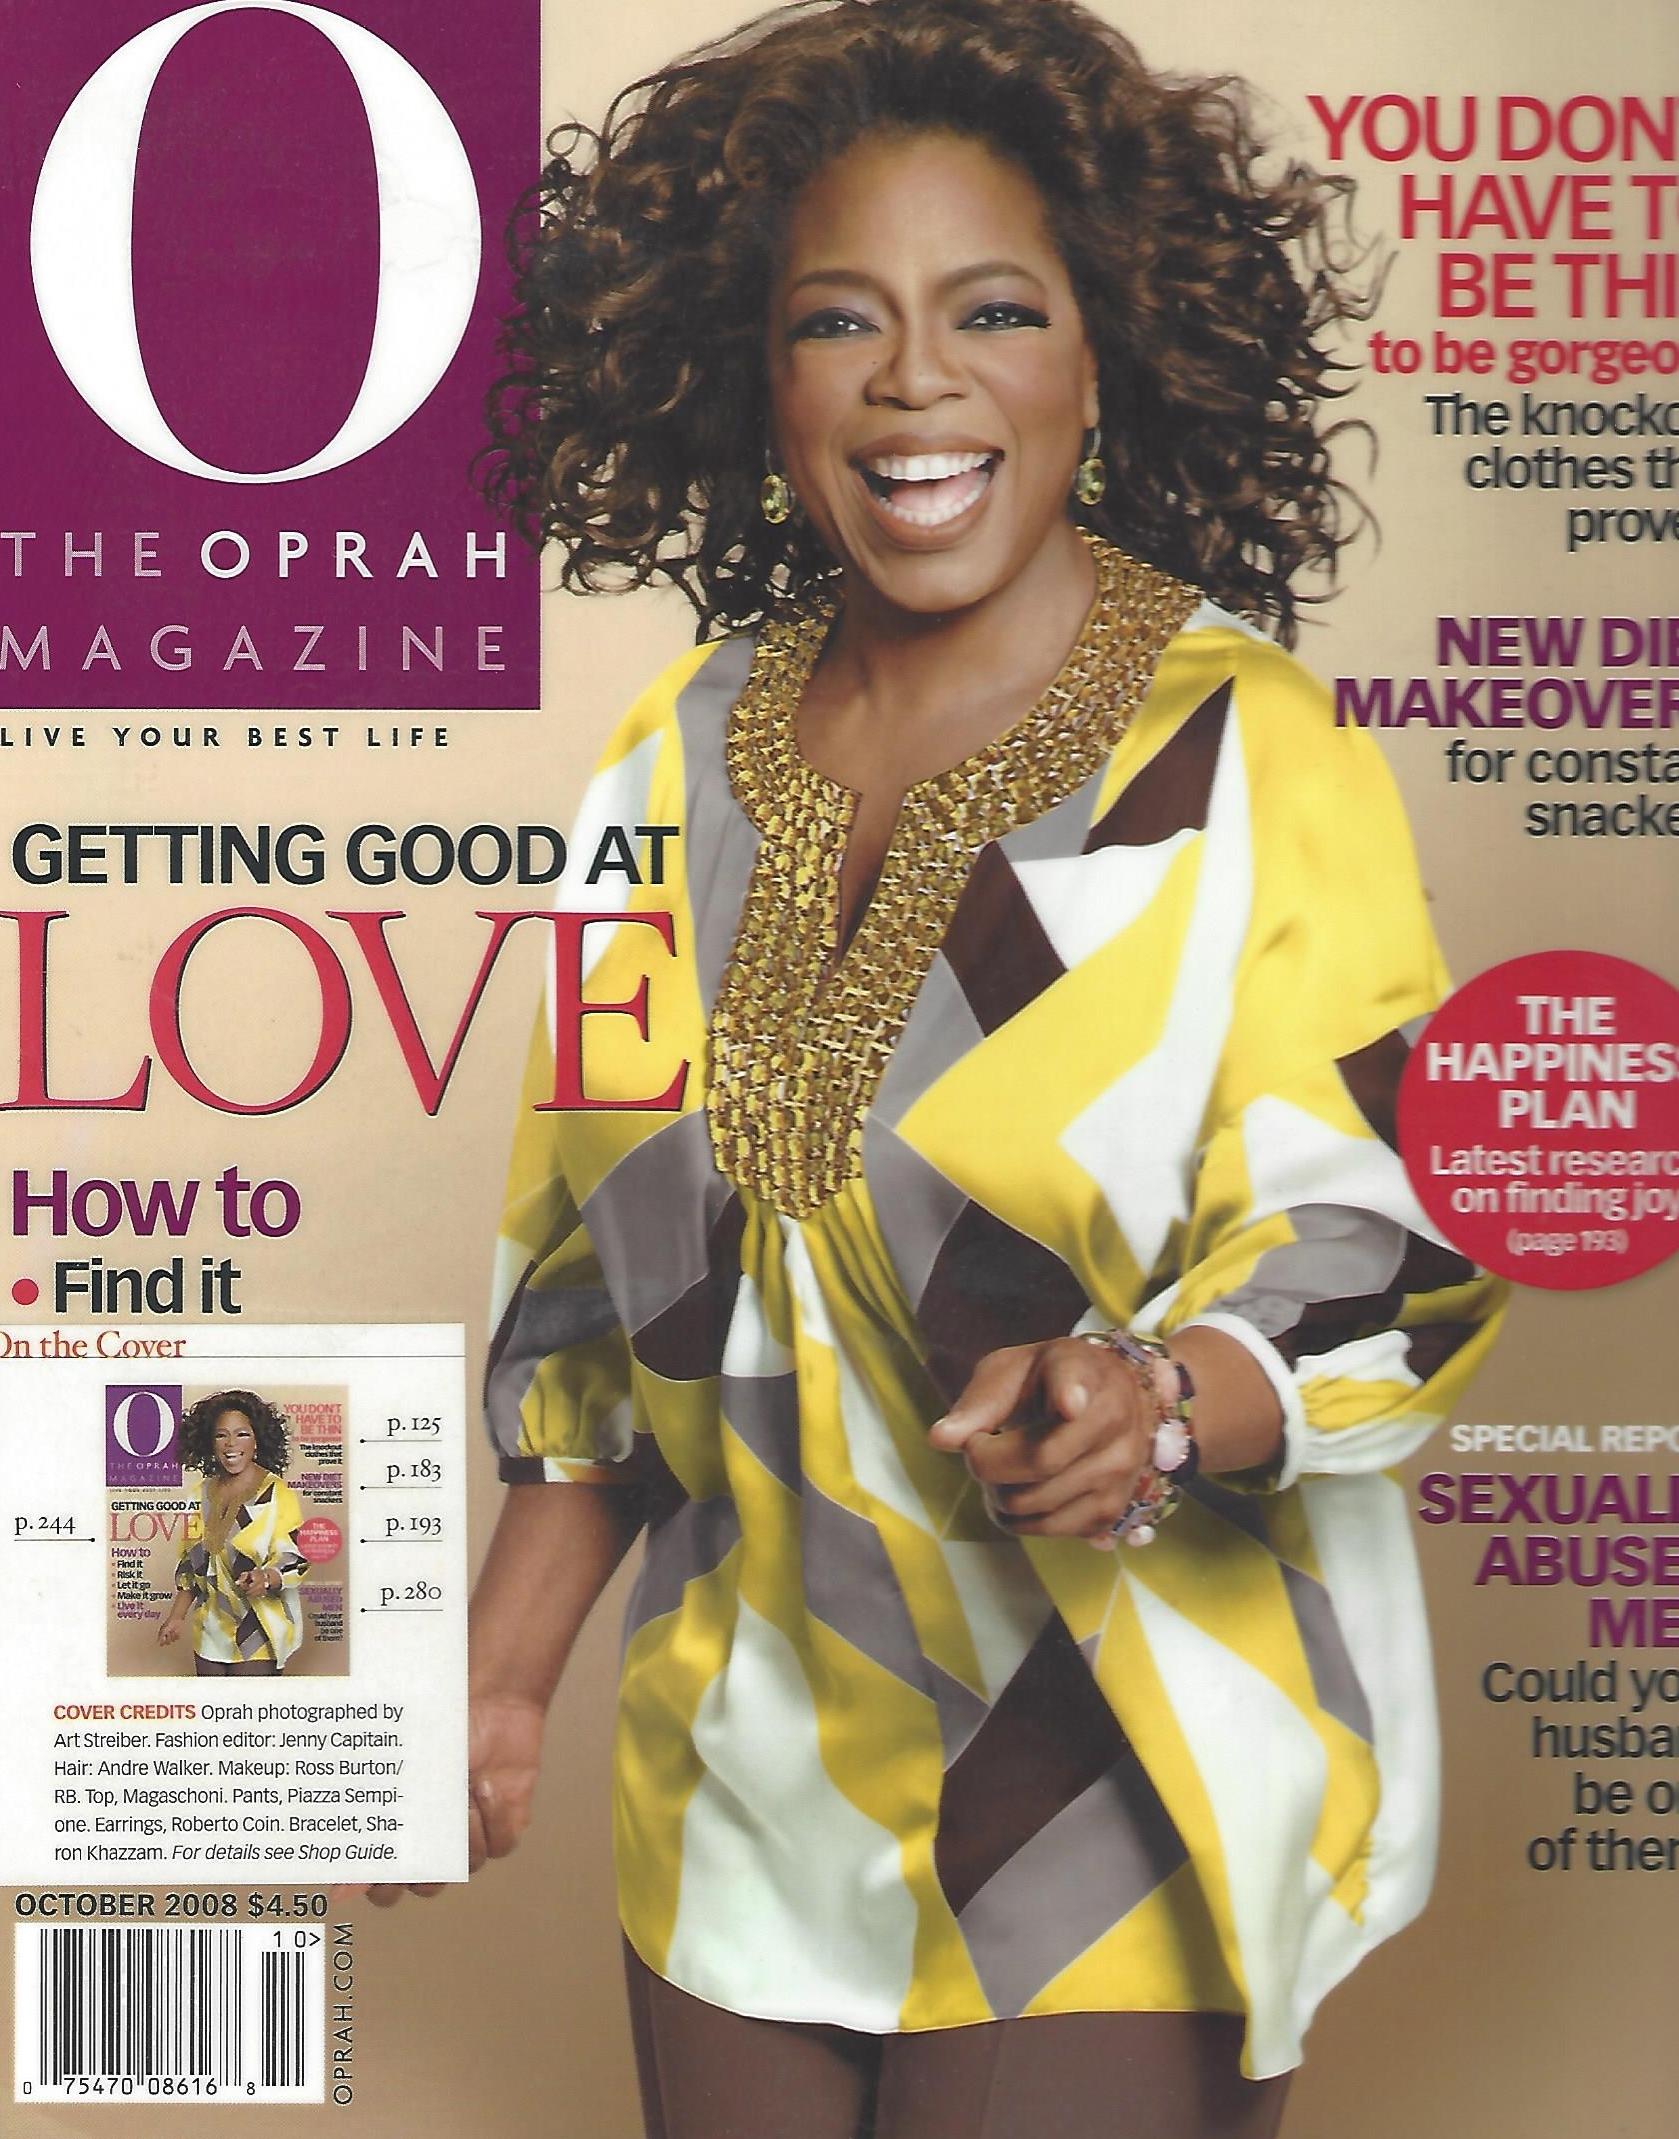 2008-O Magazine.jpg